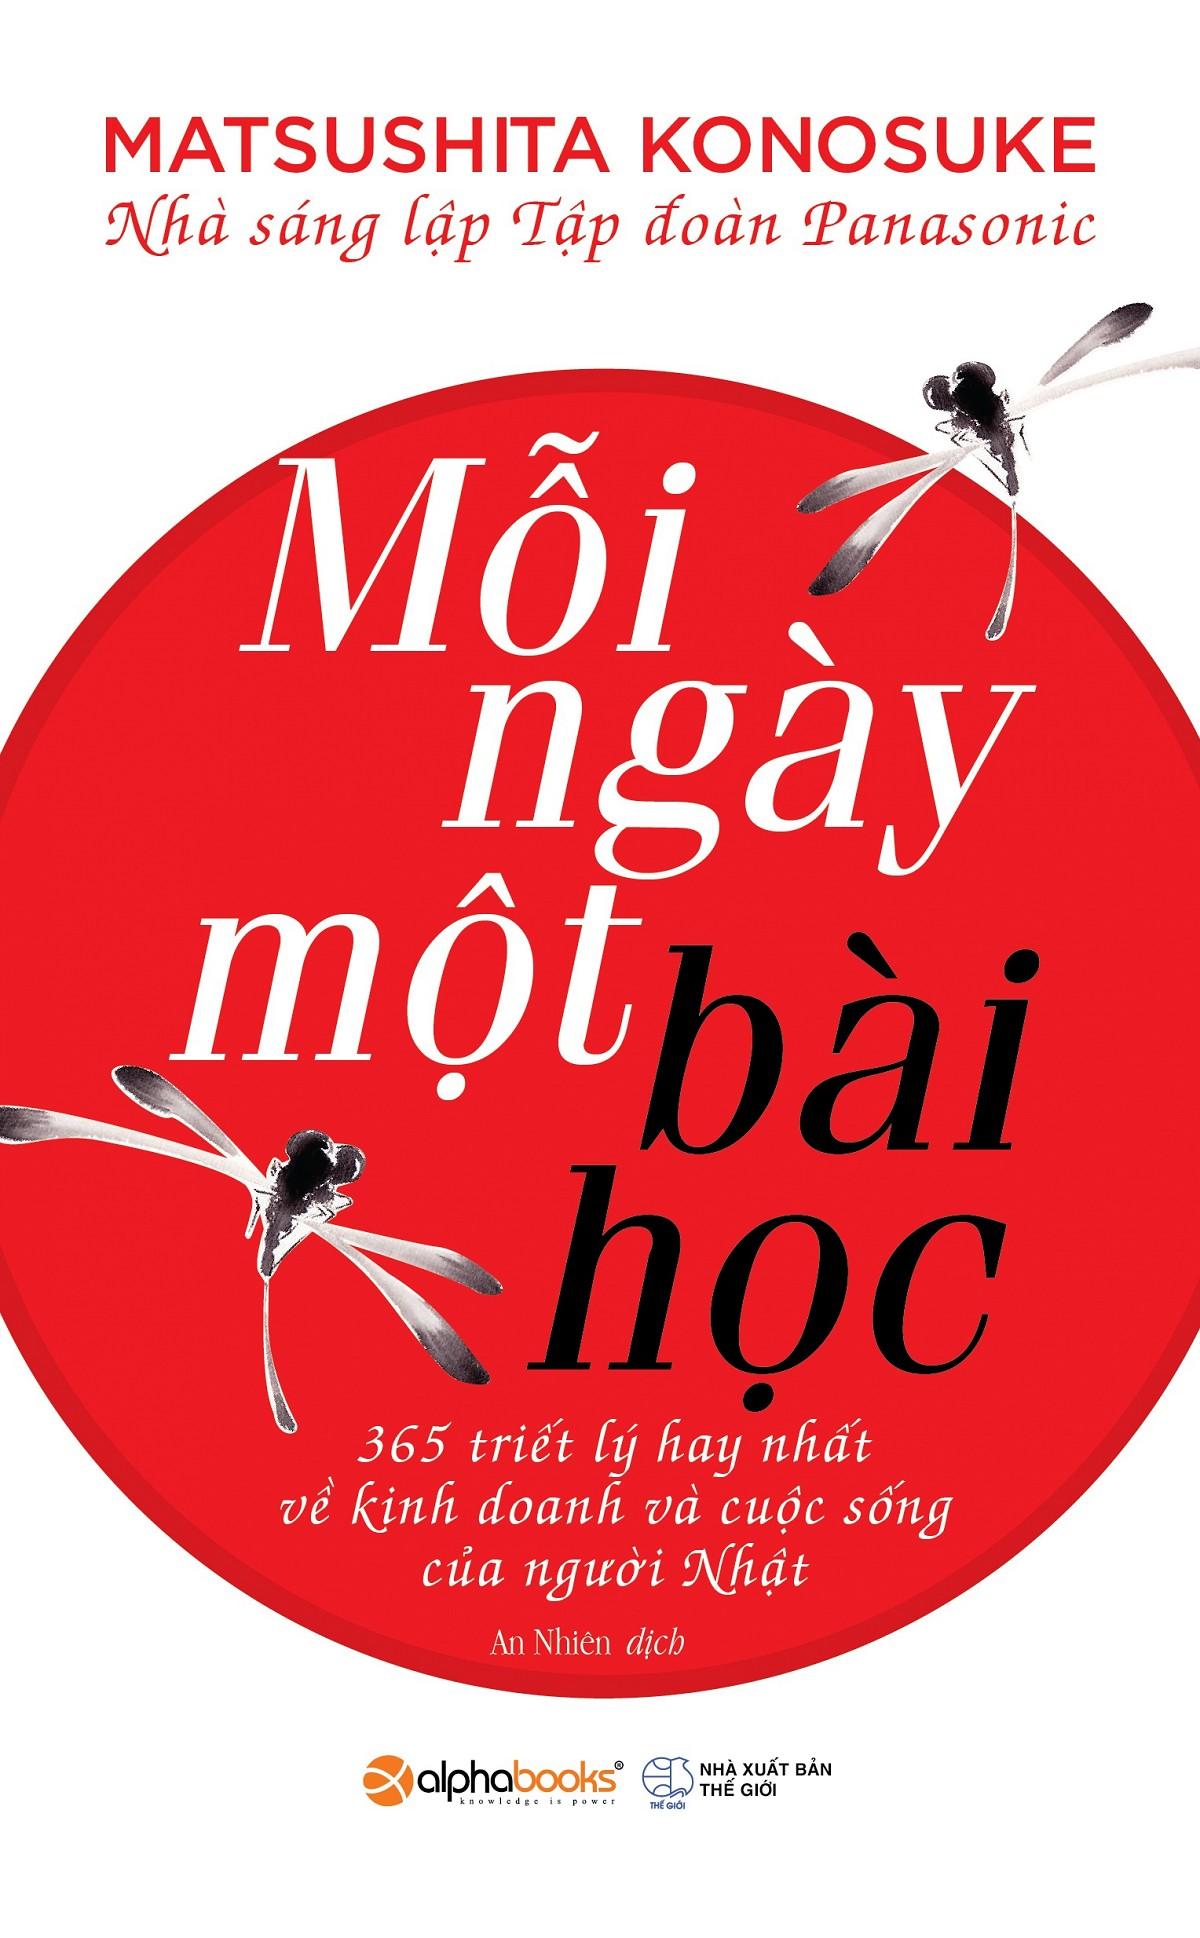 moi-ngay-mot-bai-hoc_xuatin2411.u2487.d20161222.t154830.620.jpg